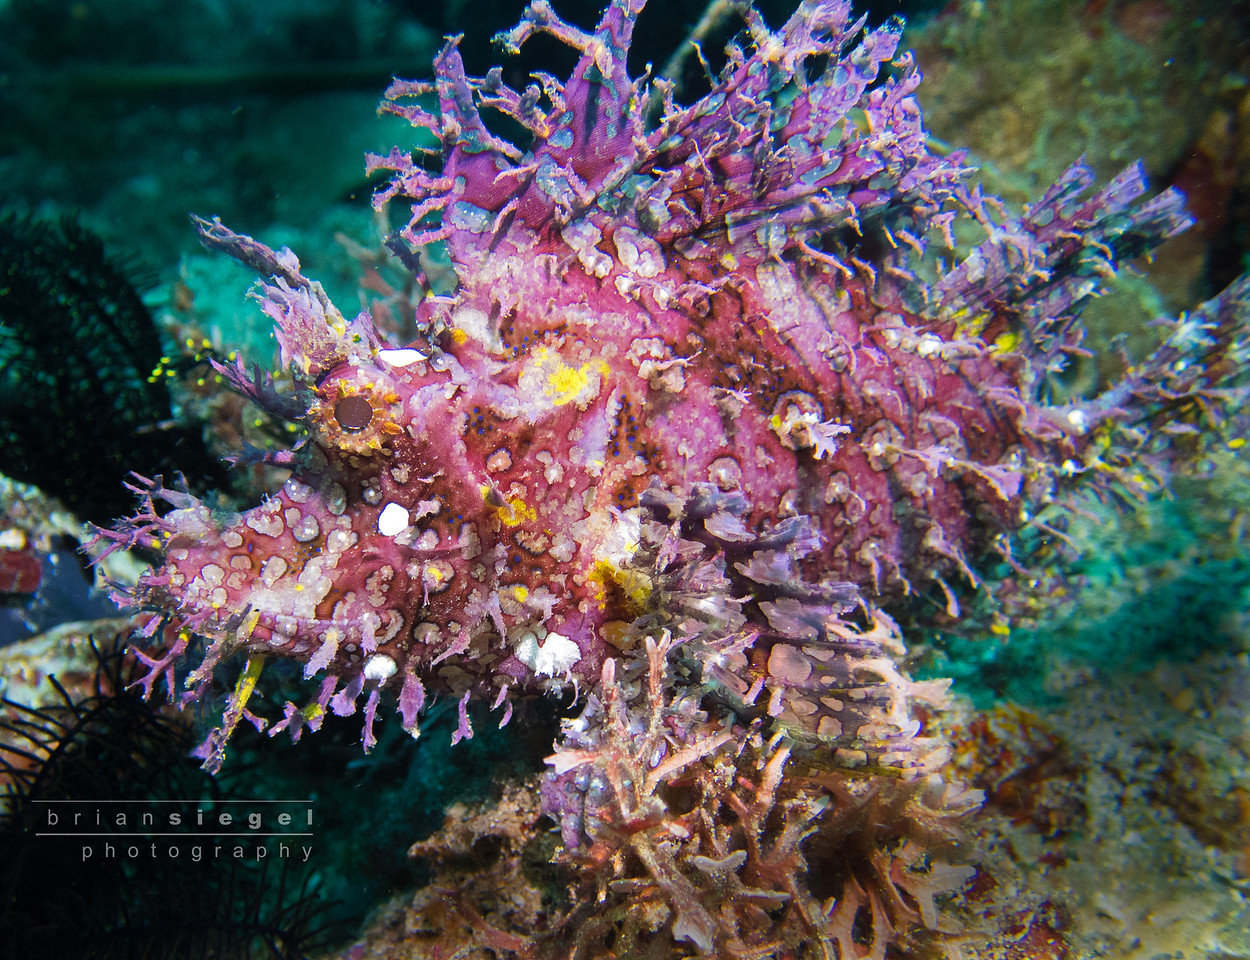 Purple Rhinopias AKA Purple Leafy Scorpionfish AKA Rhinopias Frondosa